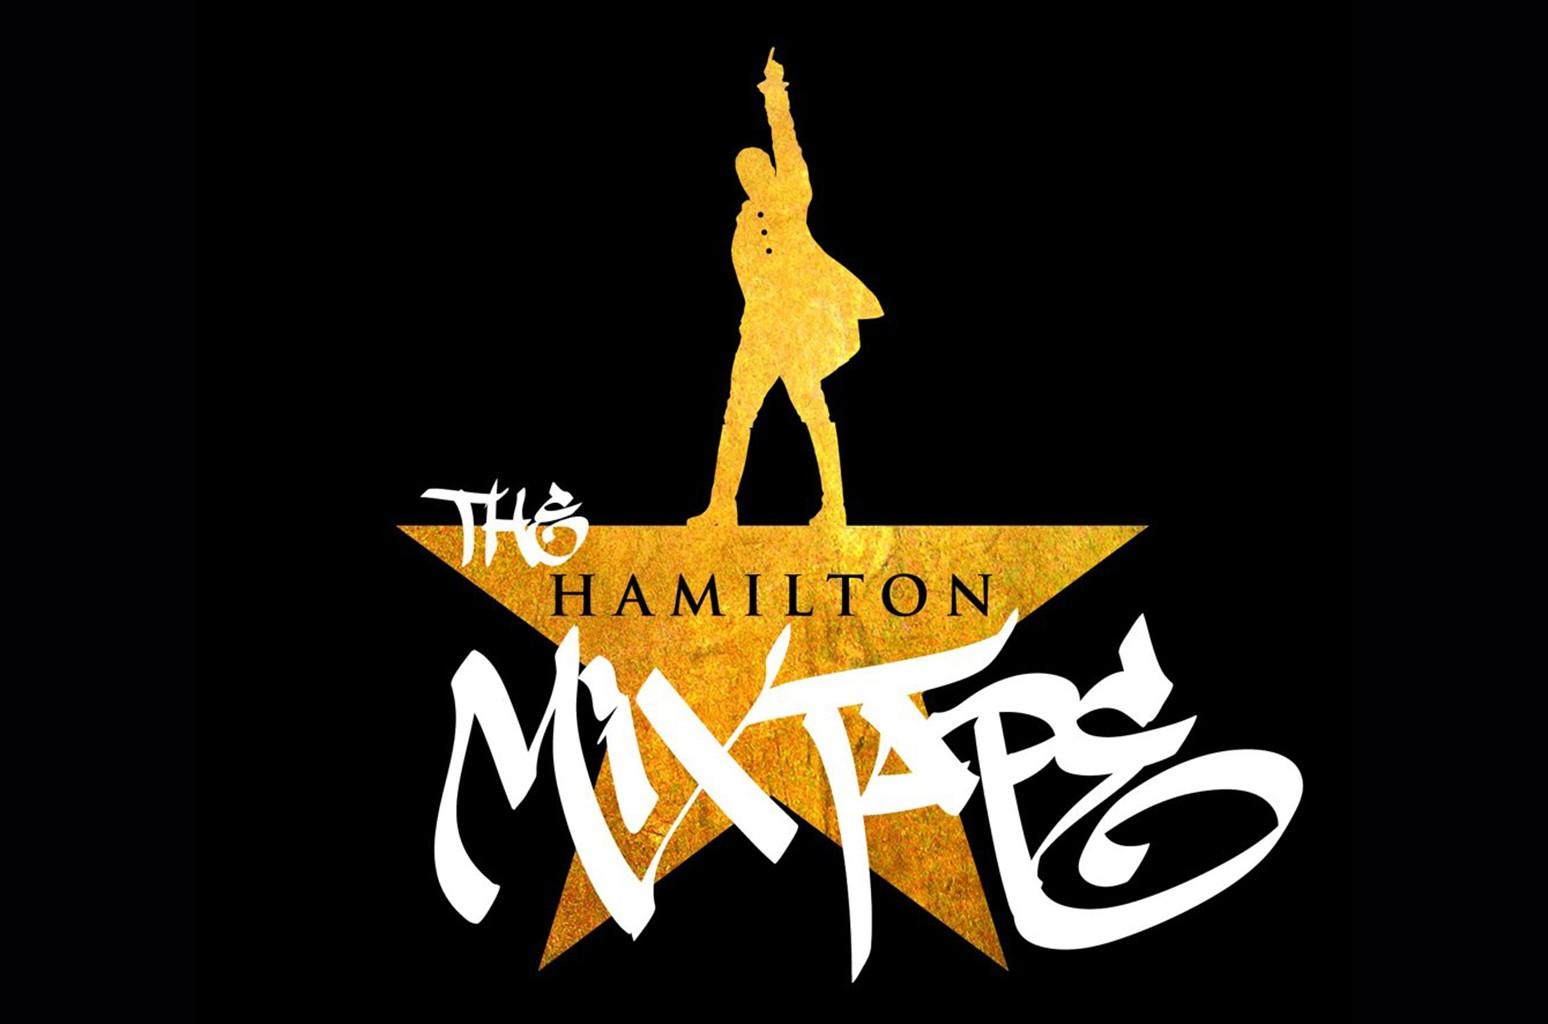 """The Hamilton Mixtape"" cover art."